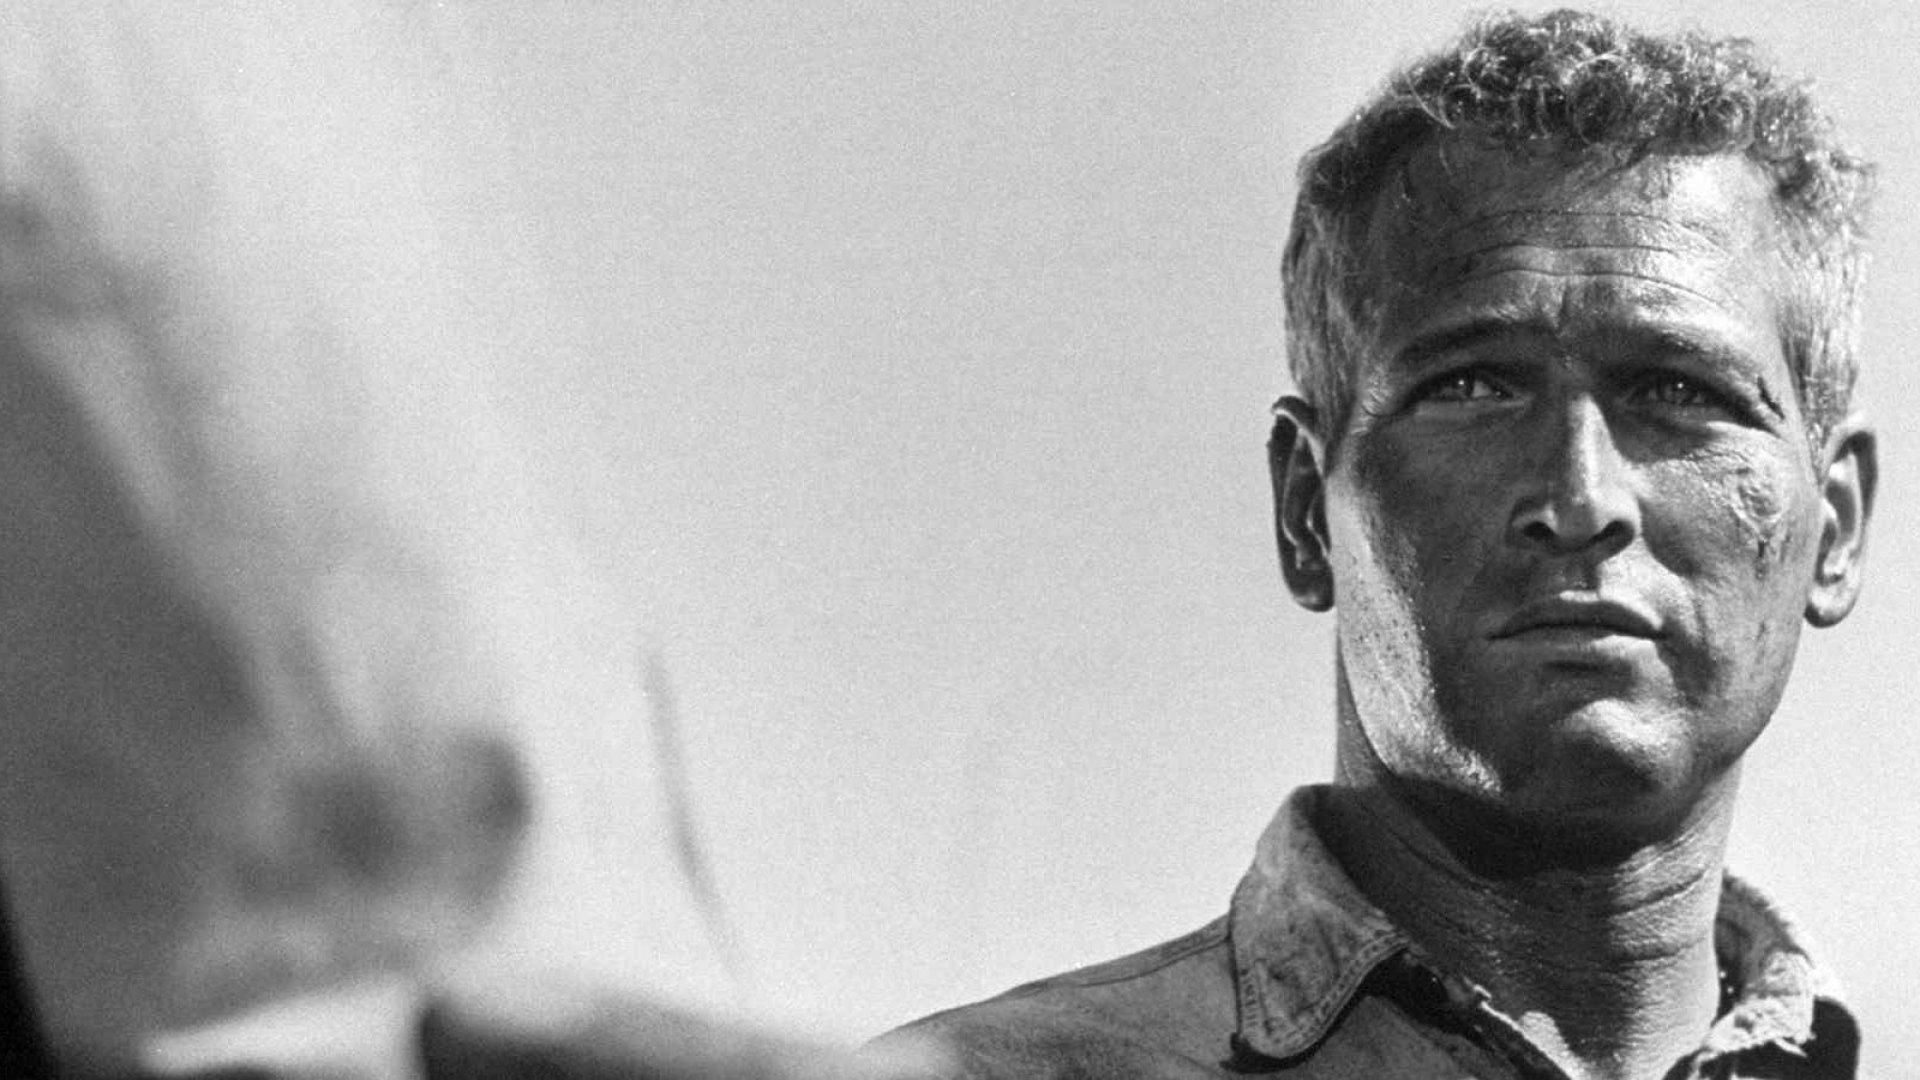 Paul Newman as Cool Hand Luke.